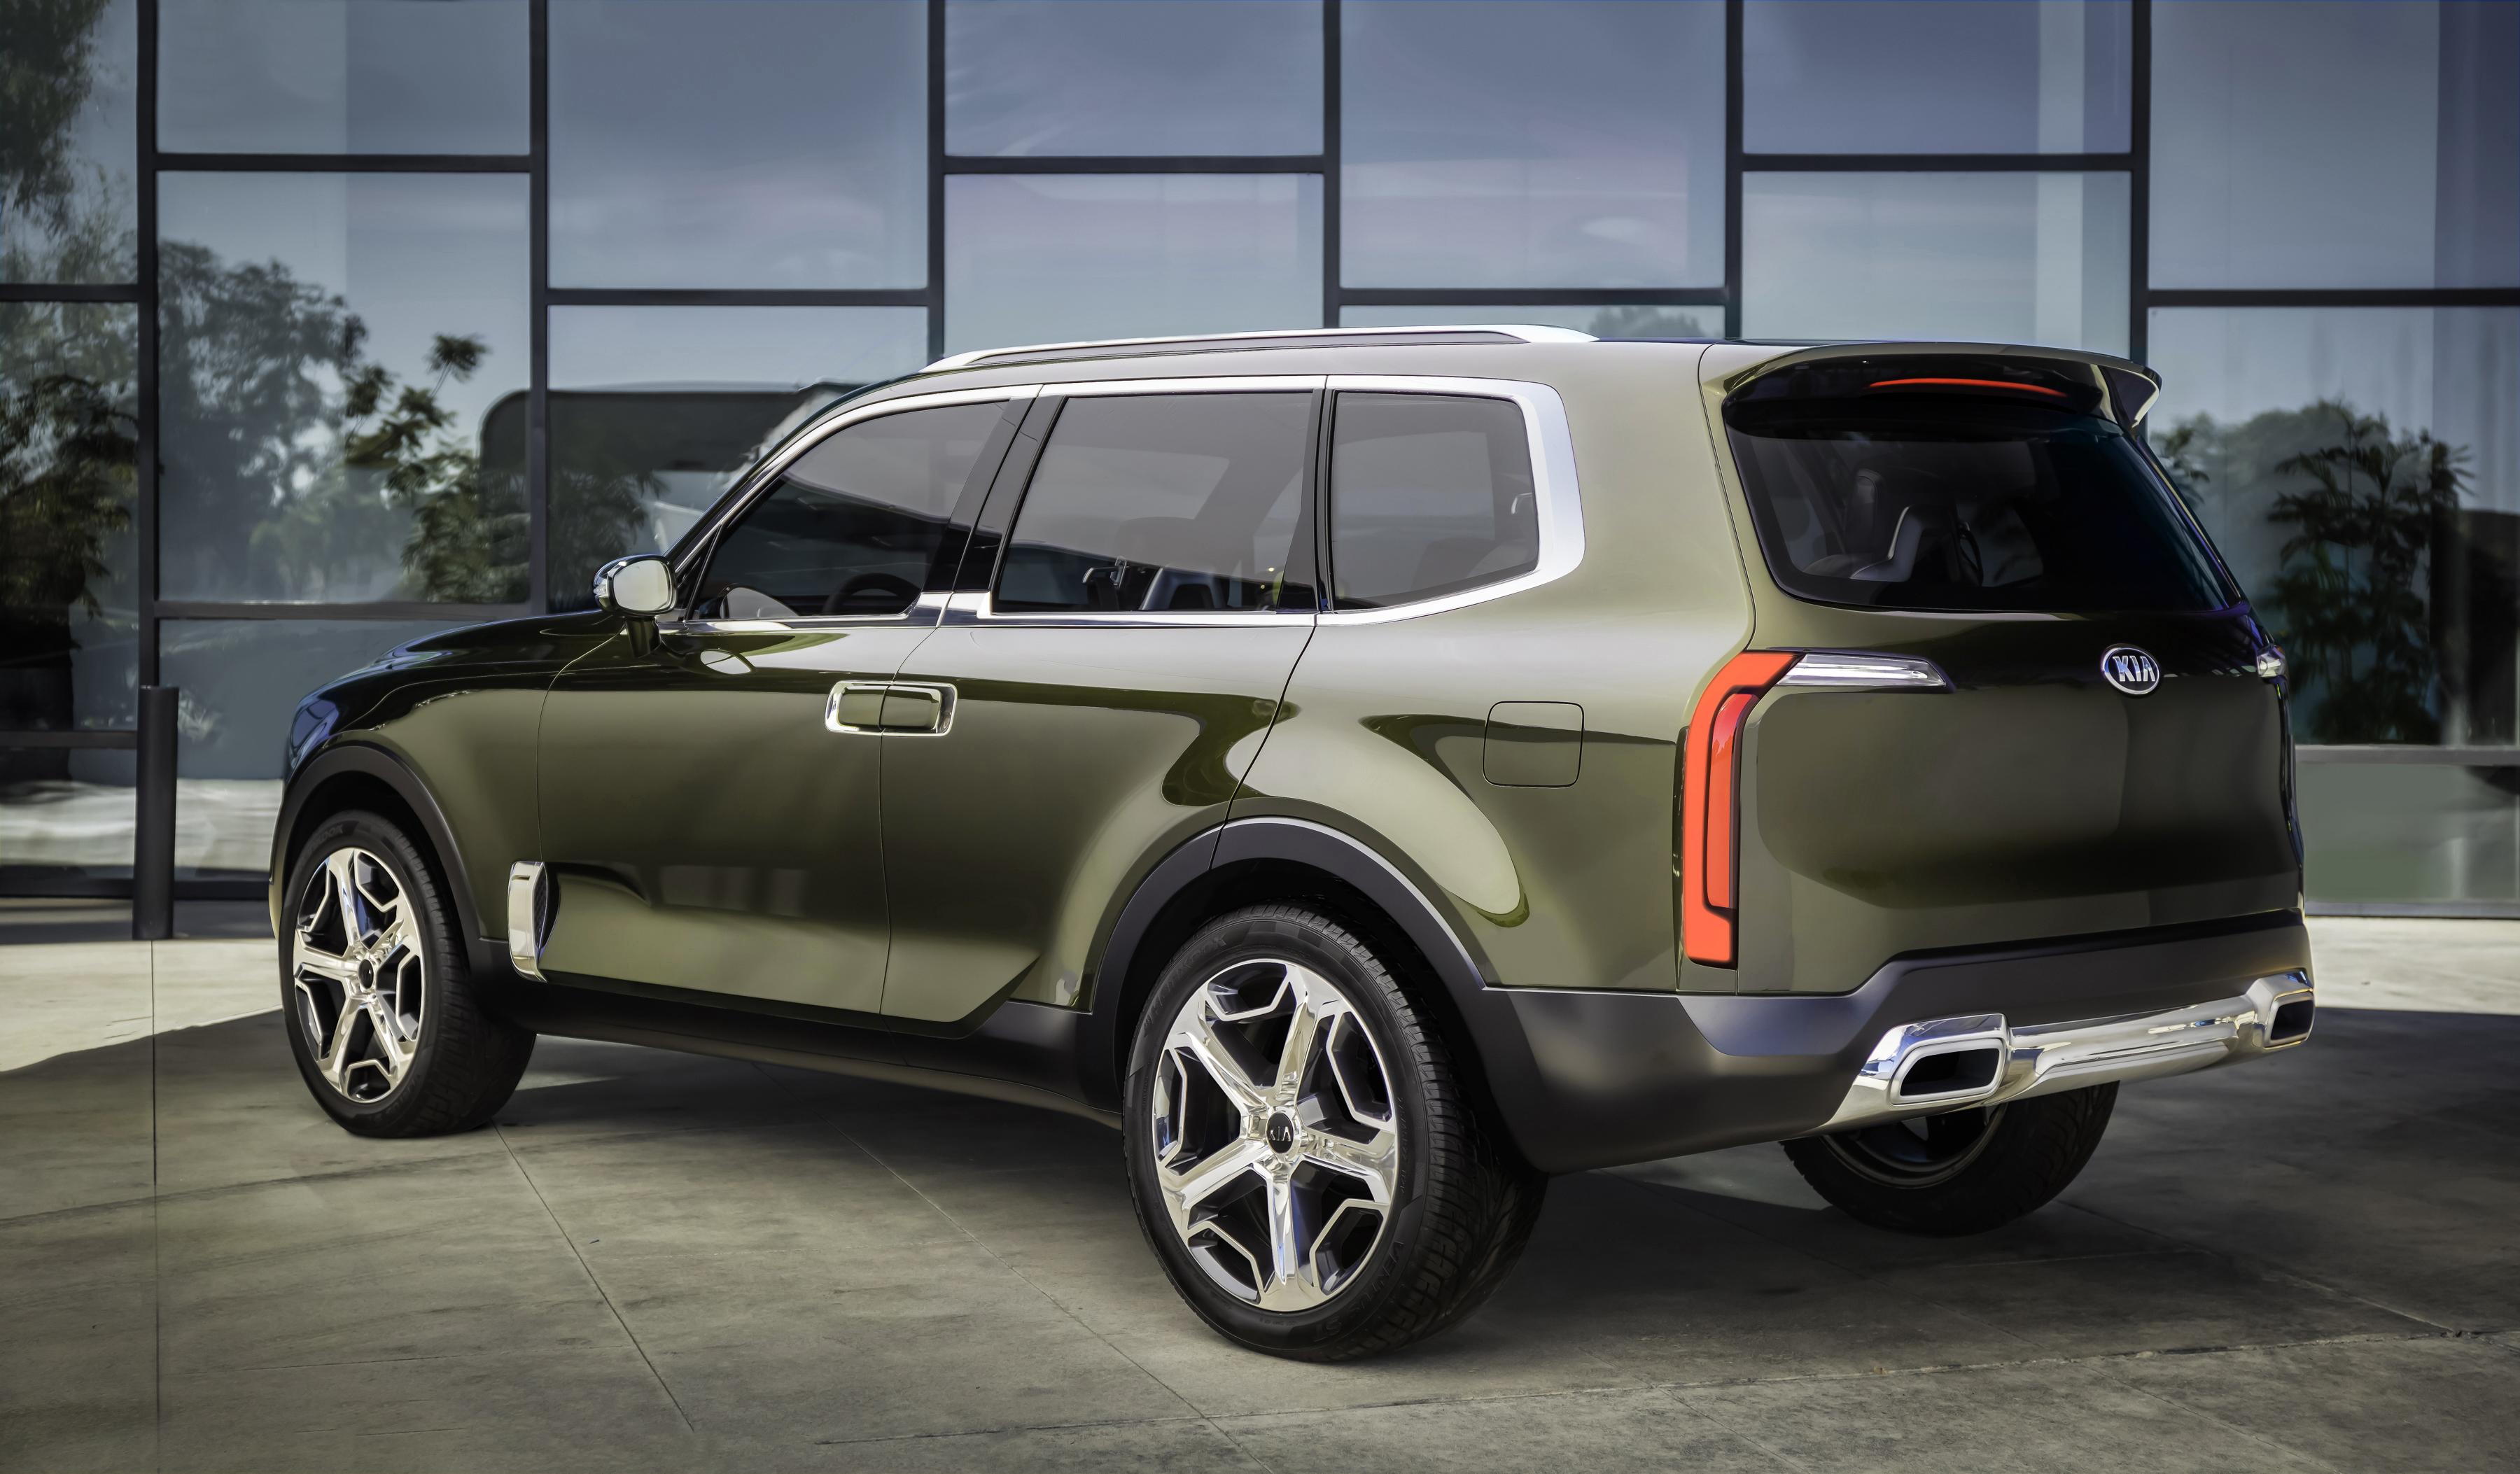 FOTO: Kia Telluride anunta un nou SUV coreean de mari dimensiuni